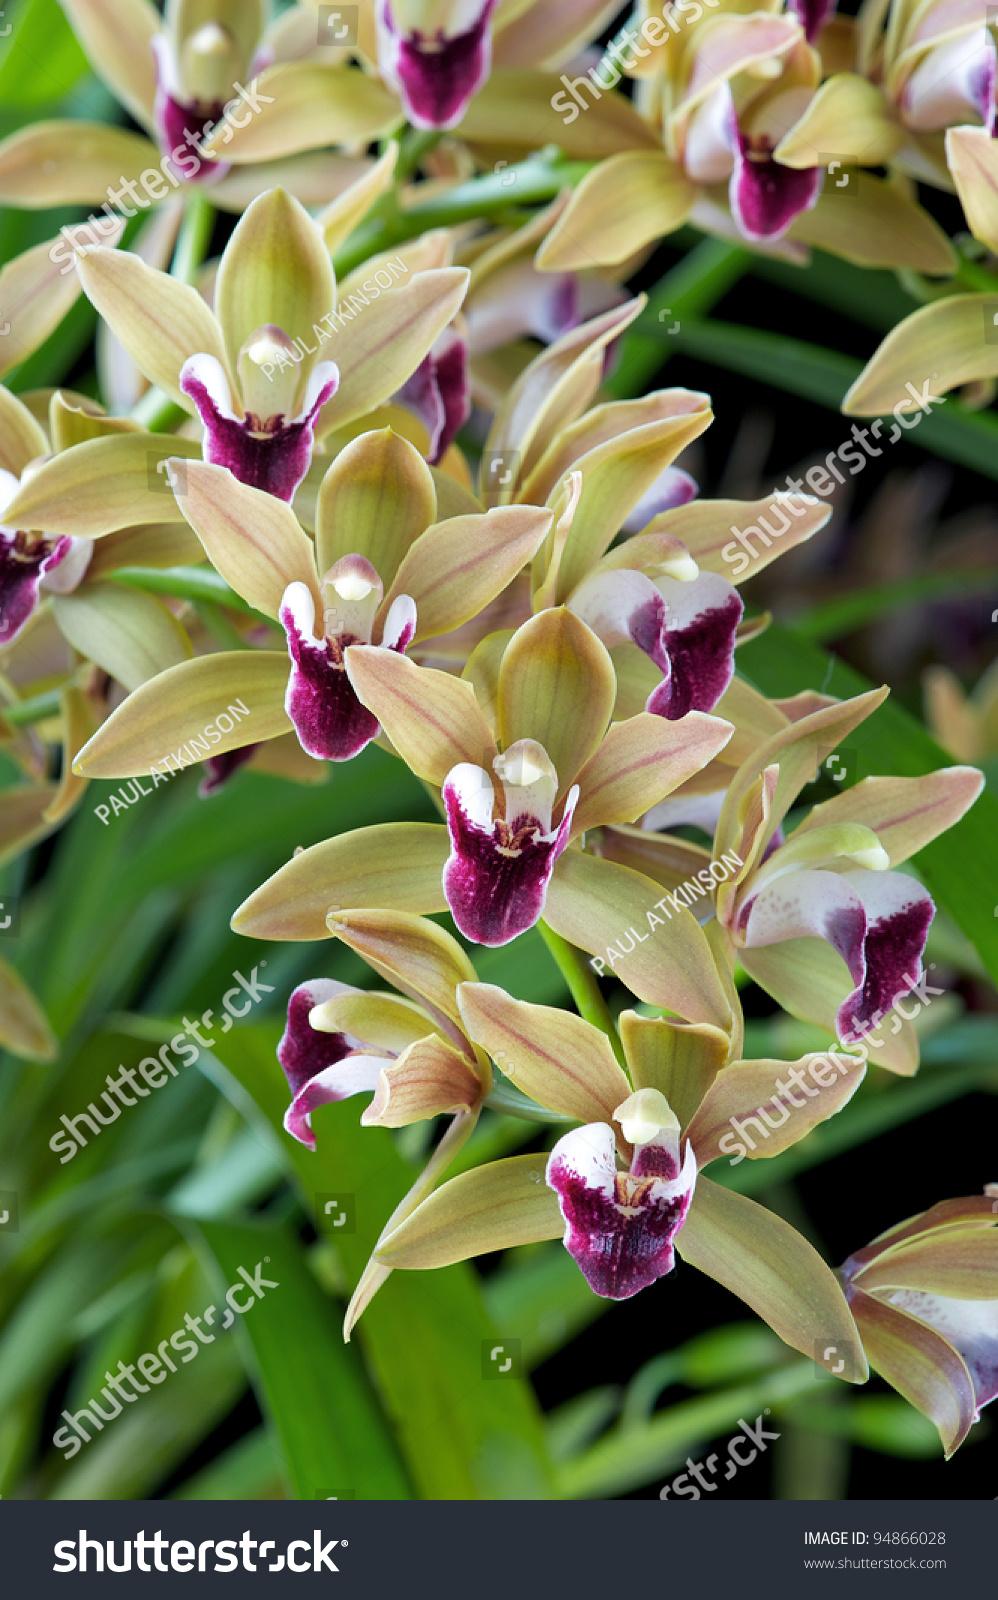 Cymbidium Devonianum 'Berry' Orchid Stock Photo 94866028 : Shutterstock